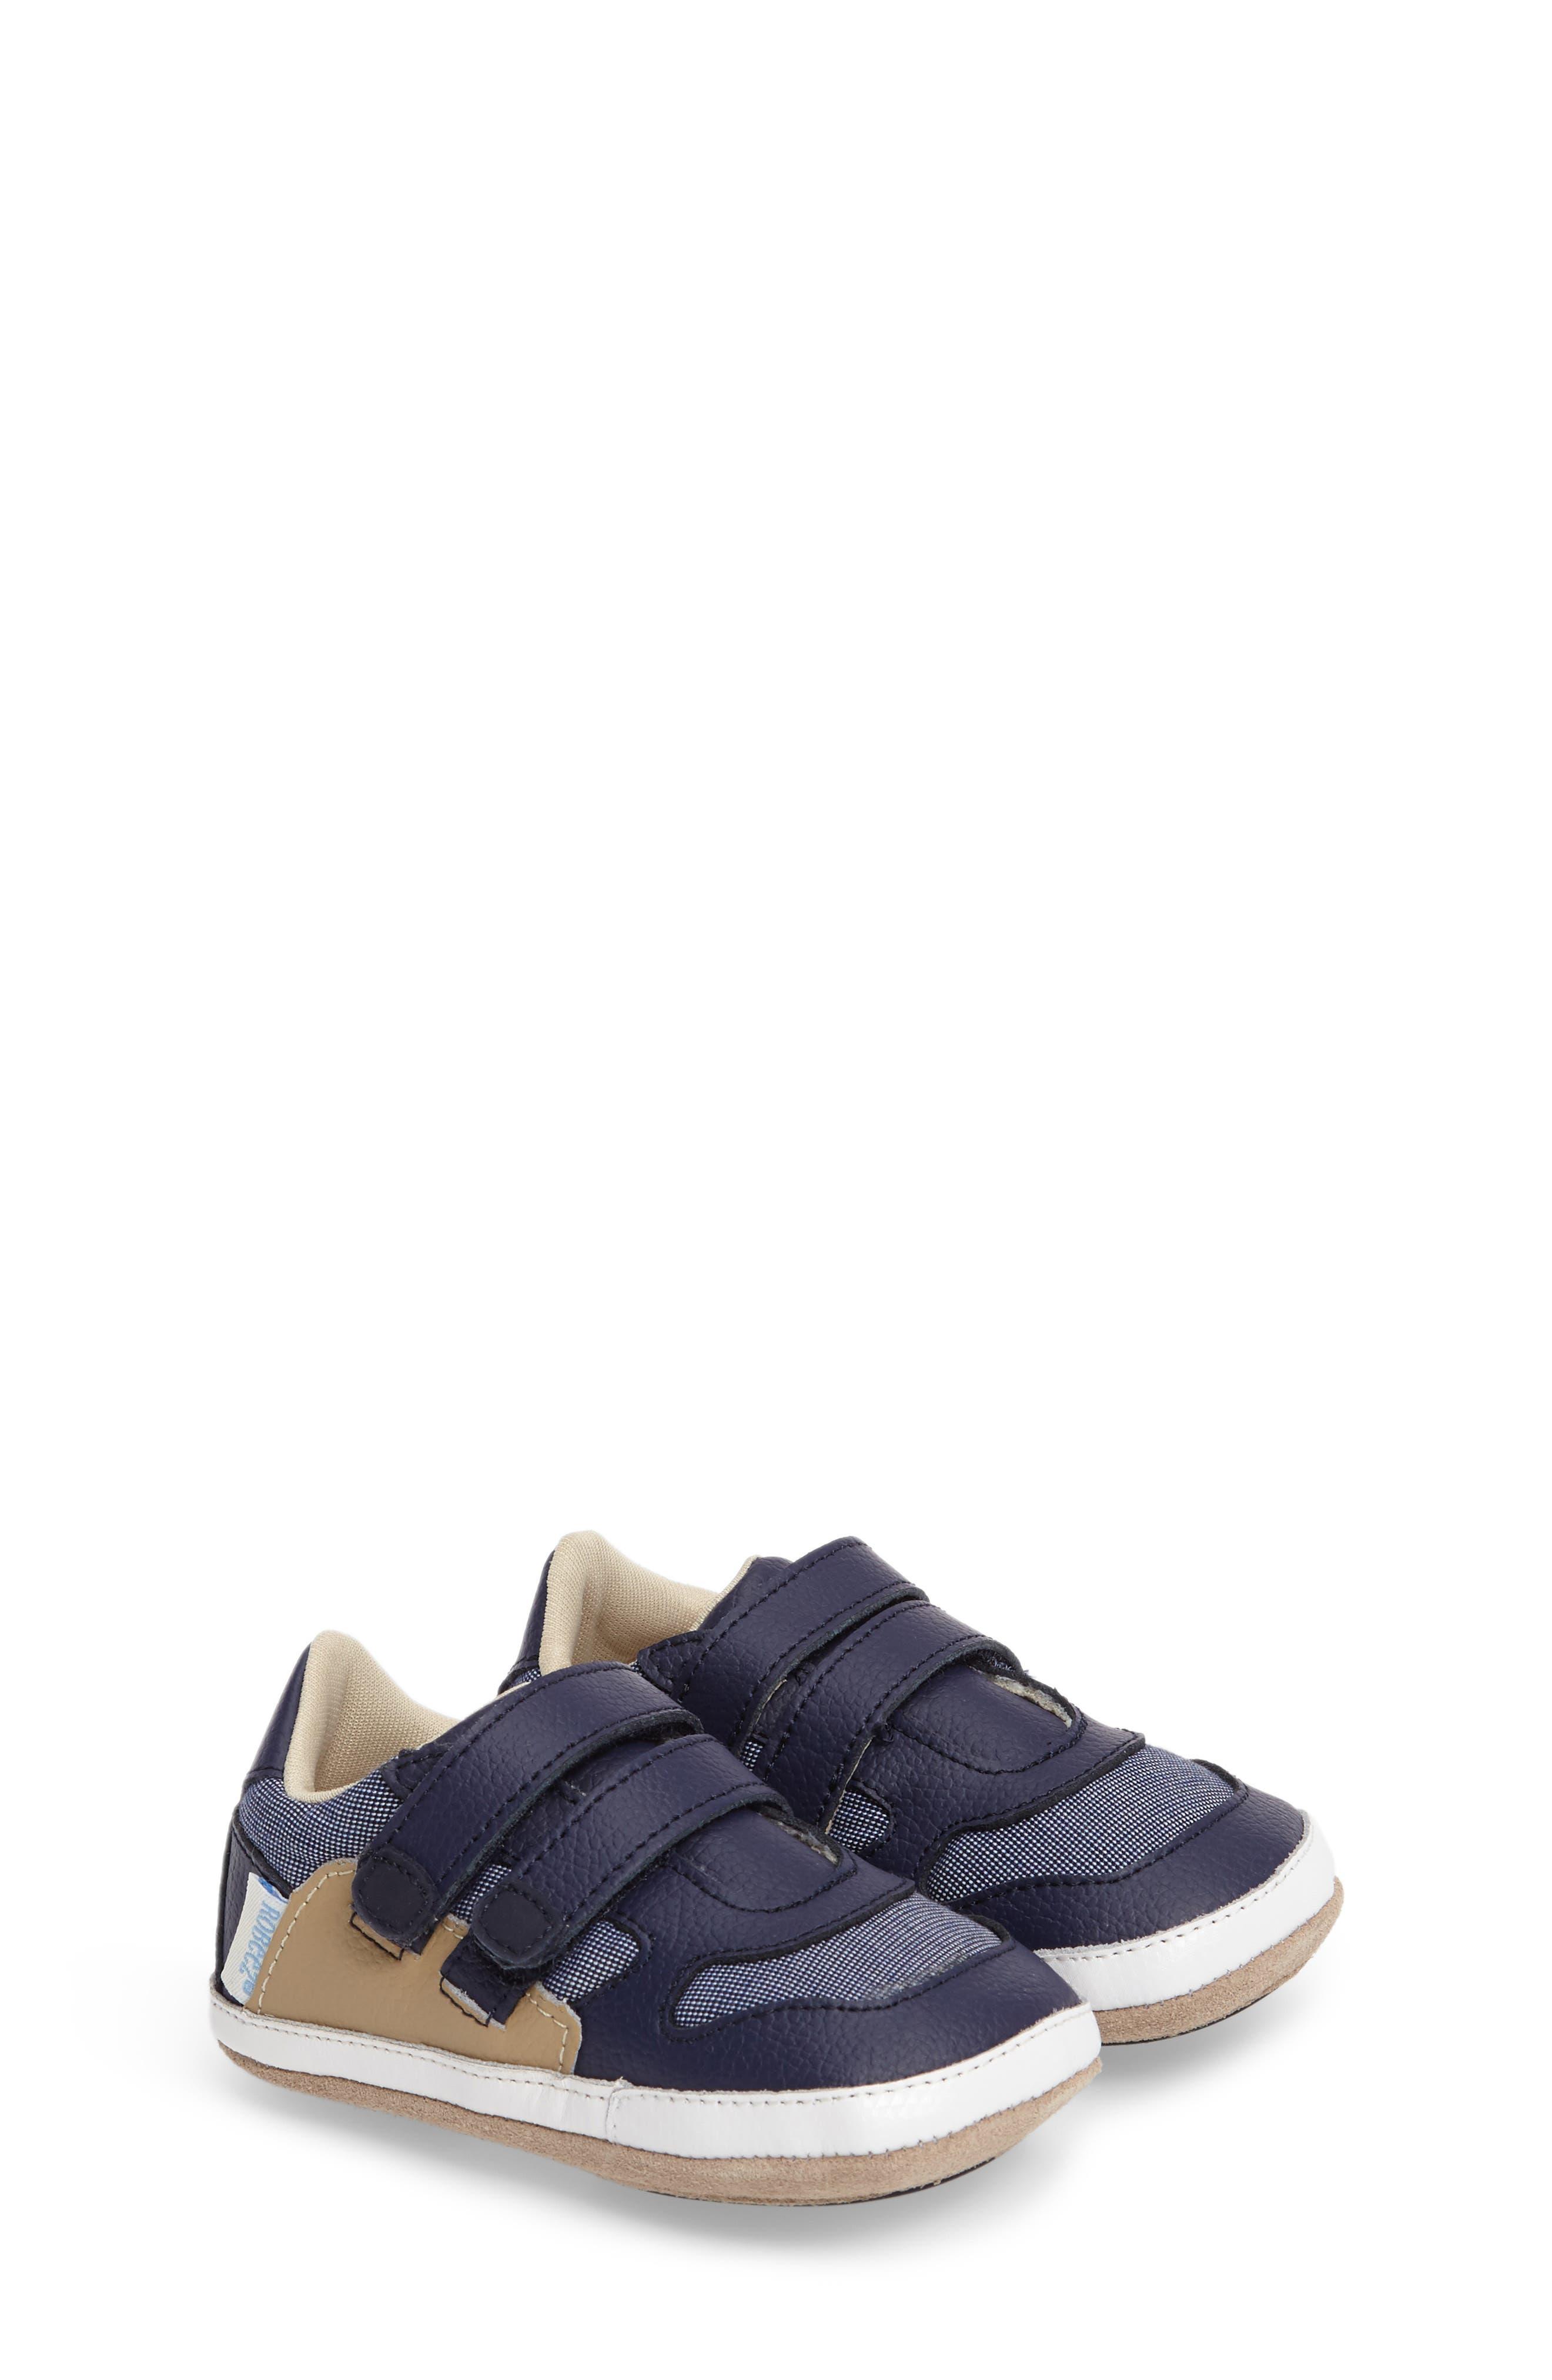 Alternate Image 1 Selected - Robeez® Jaime Crib Shoe (Baby & Walker)